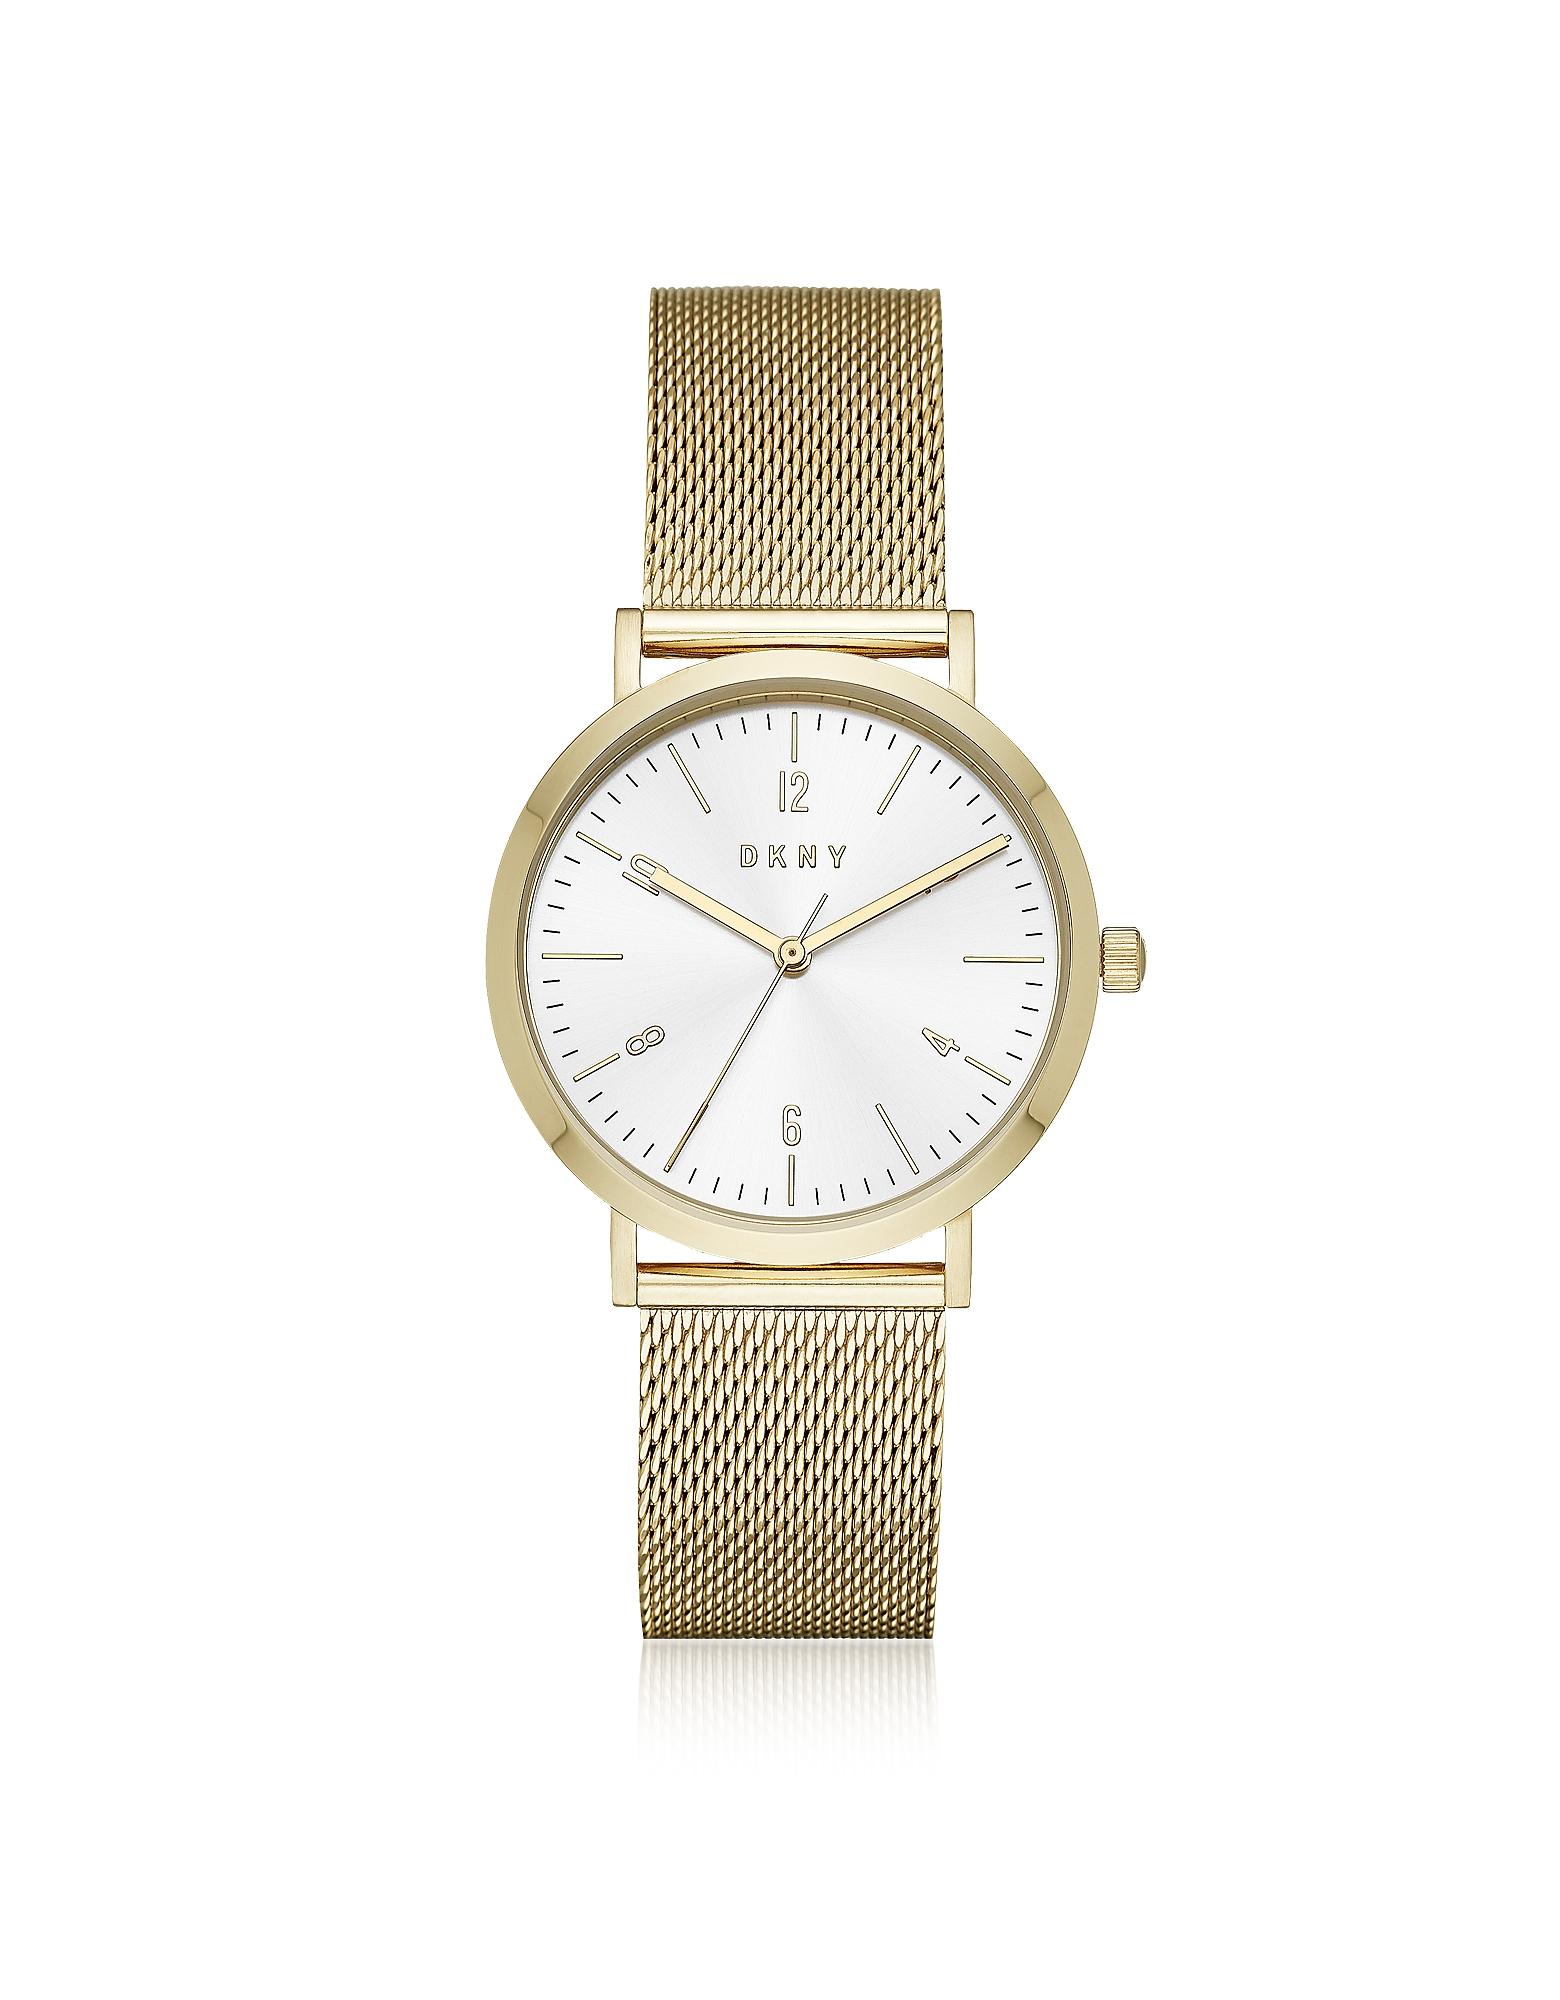 DKNY Women's Watches, Minetta Gold Tone Stainless Steel Mesh Women's Watch